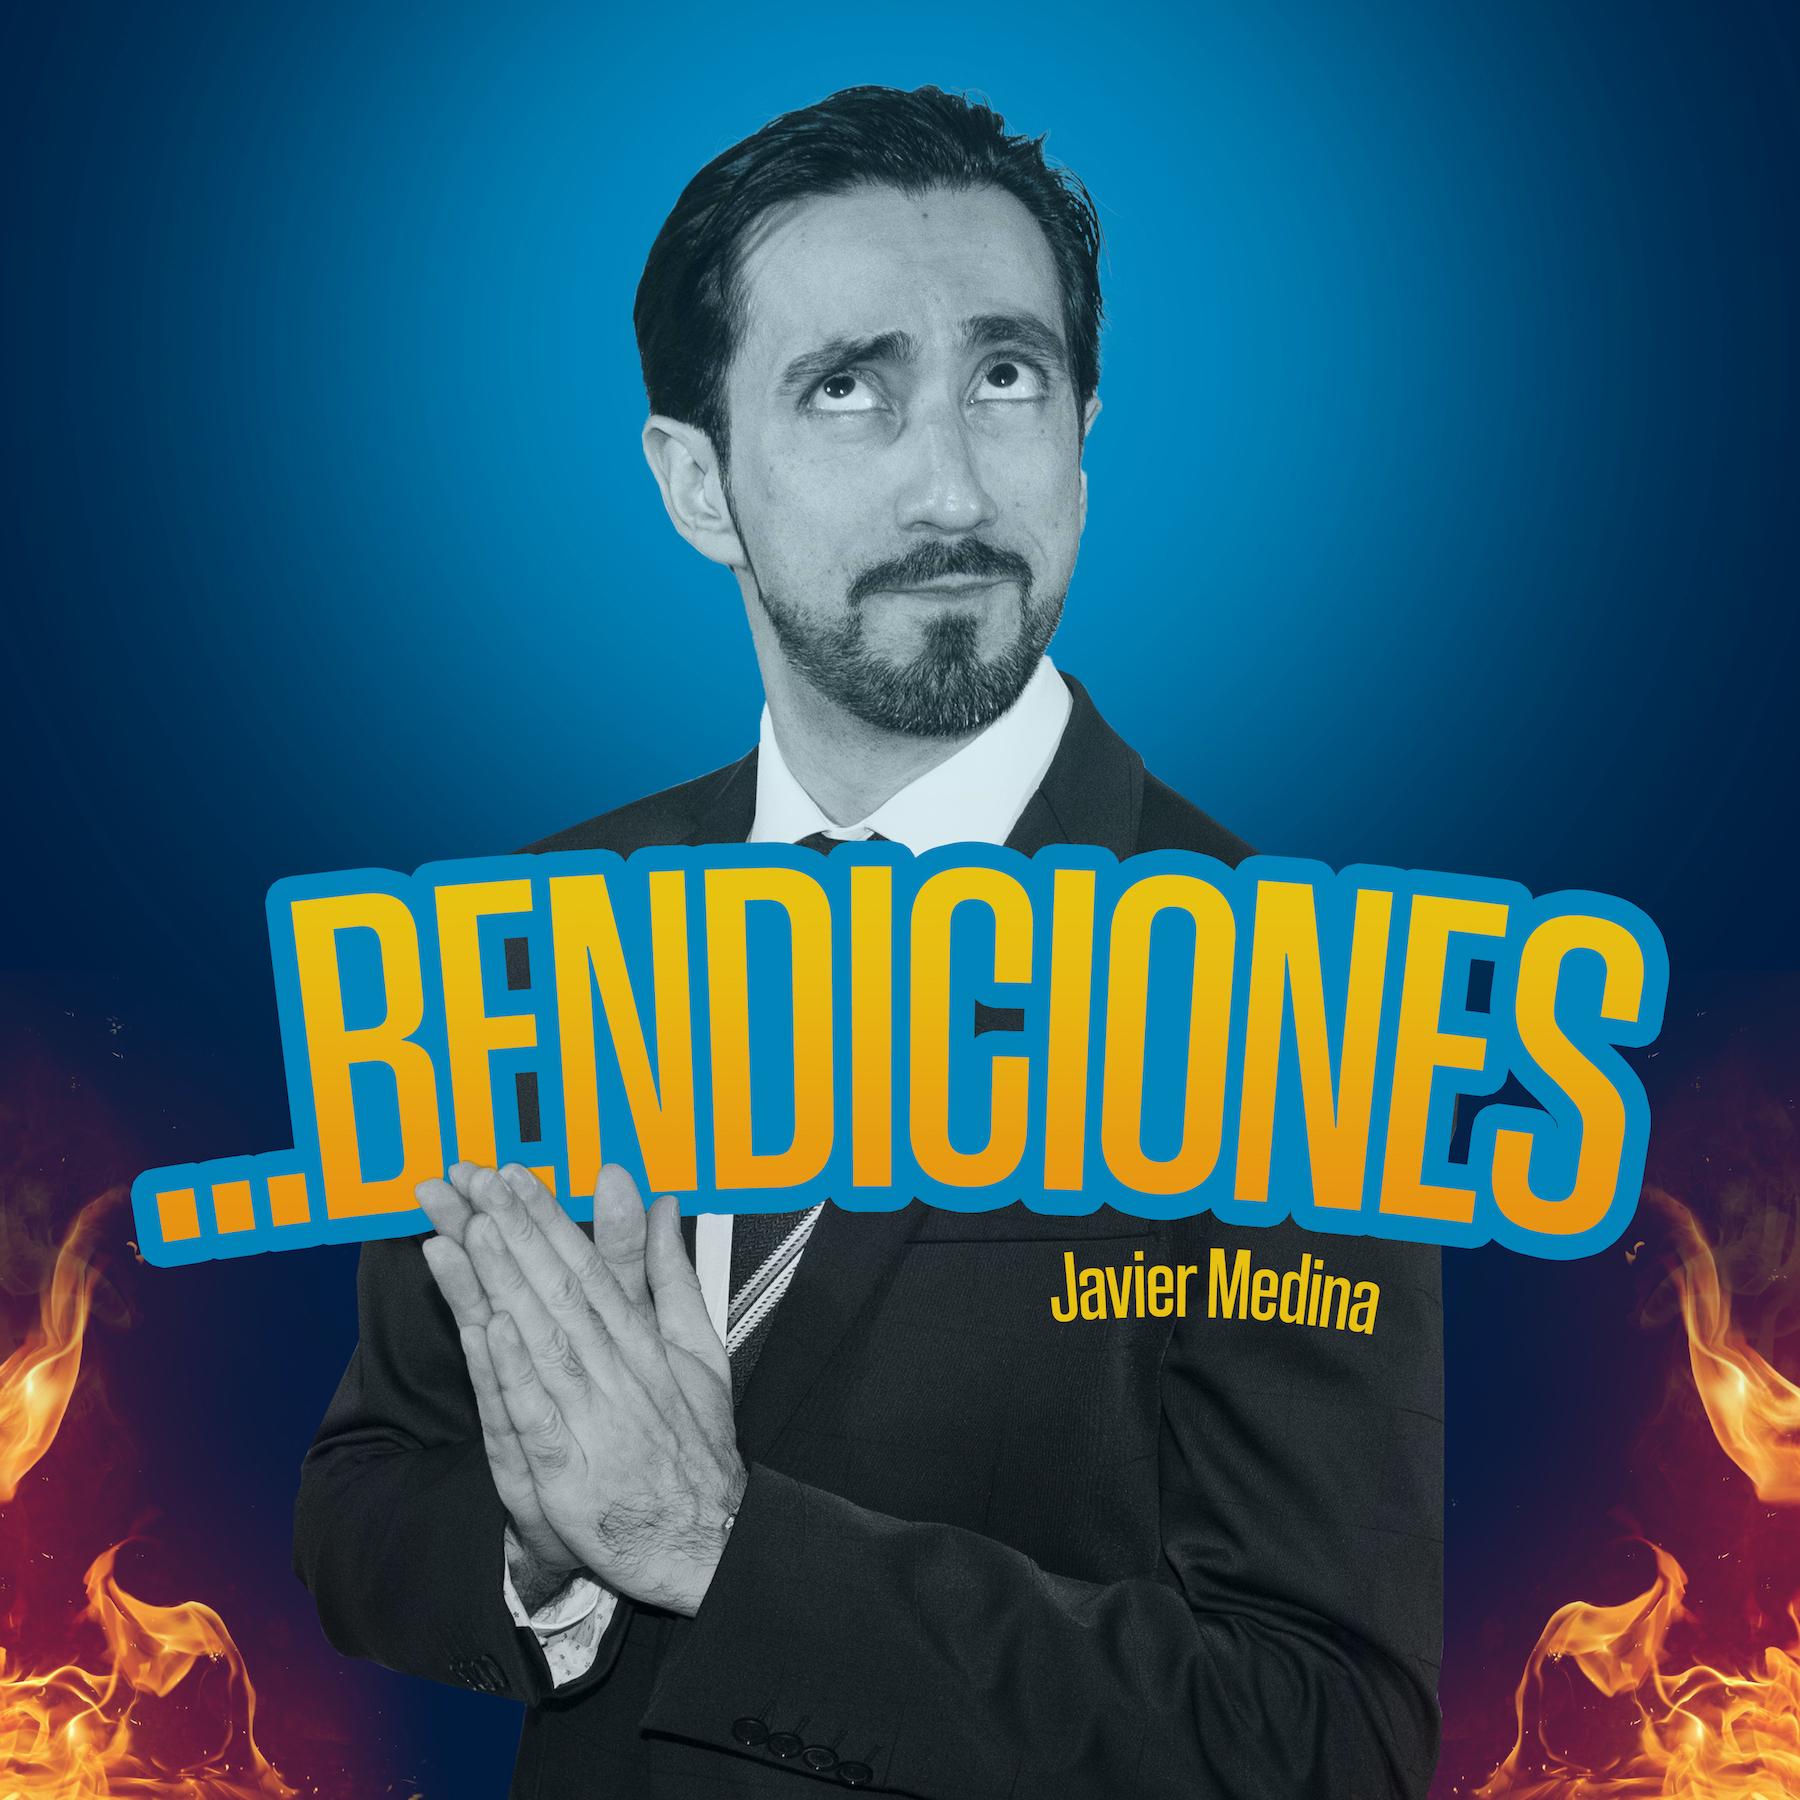 Bendiciones Javier Medina Stand Up Comedy CR